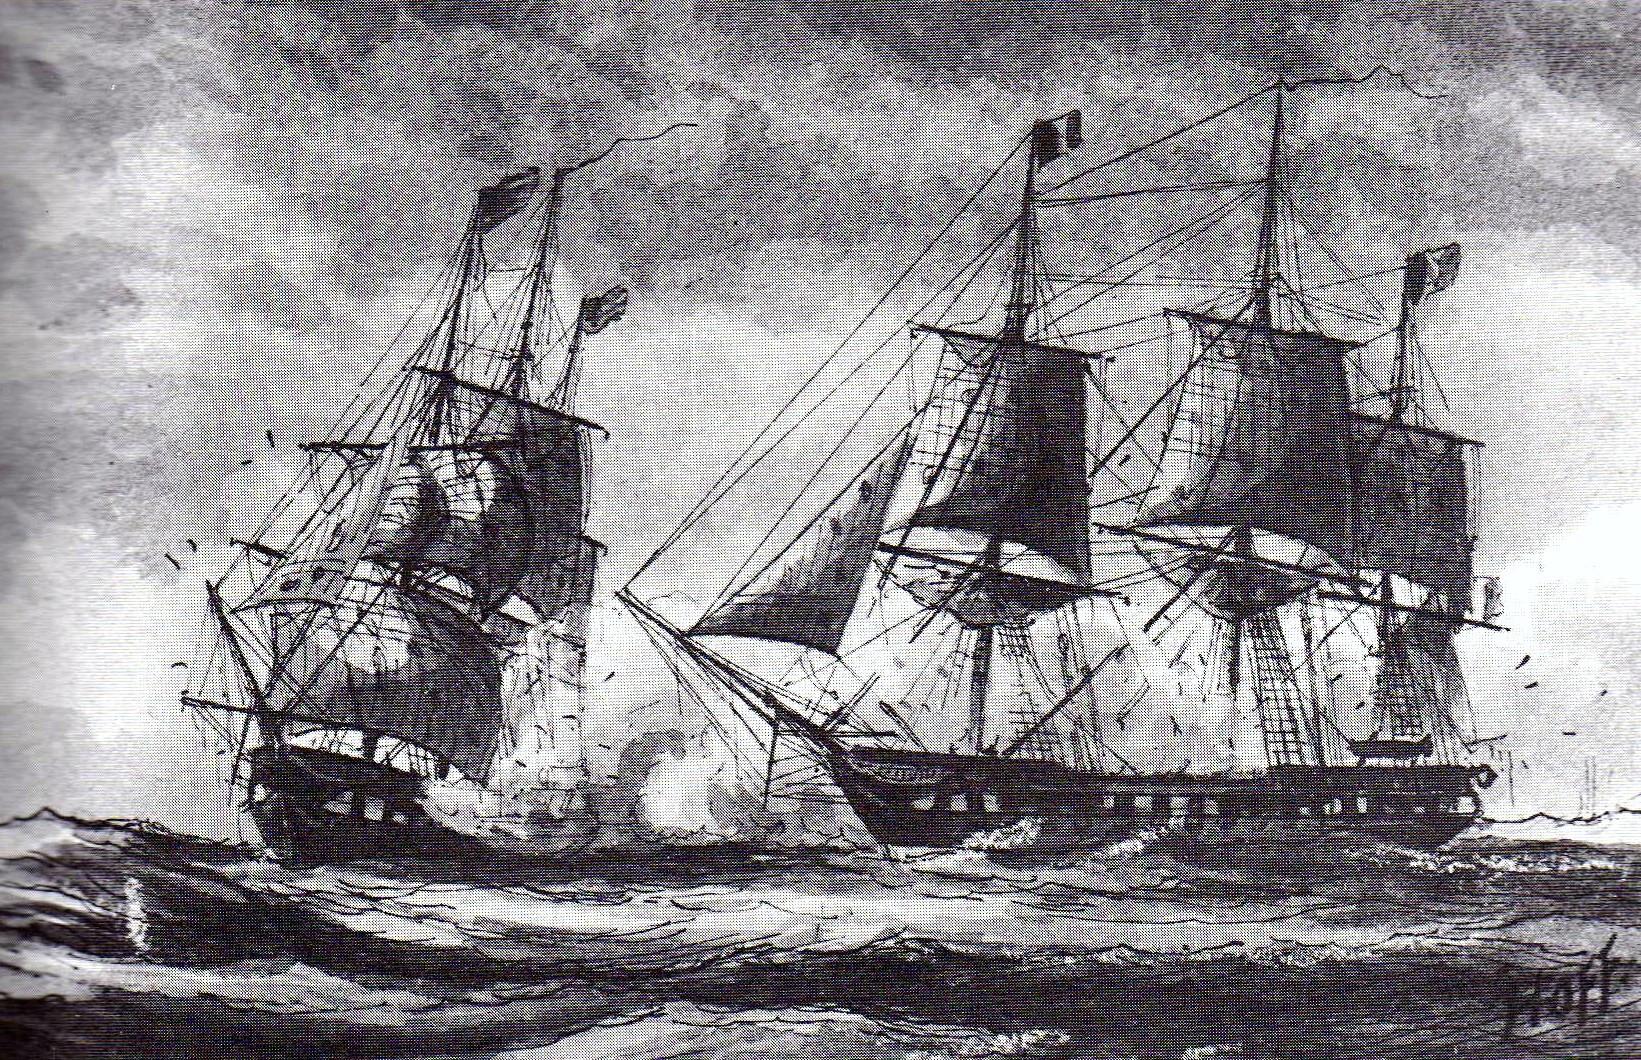 Combat_naval_pendant_la_quasi_guerre